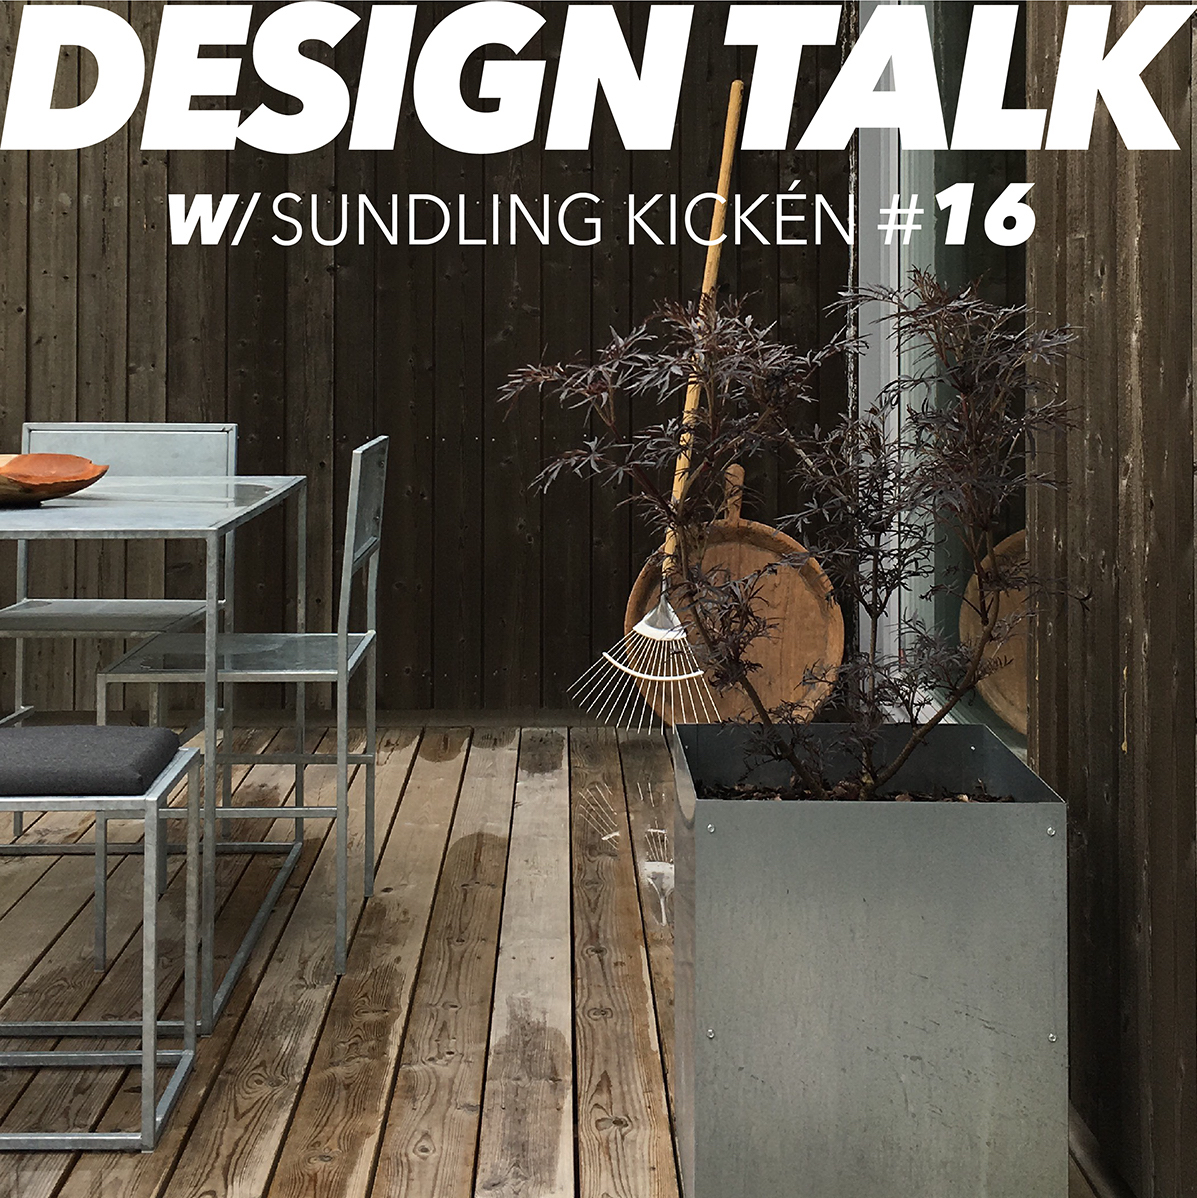 Design talk - front.jpg